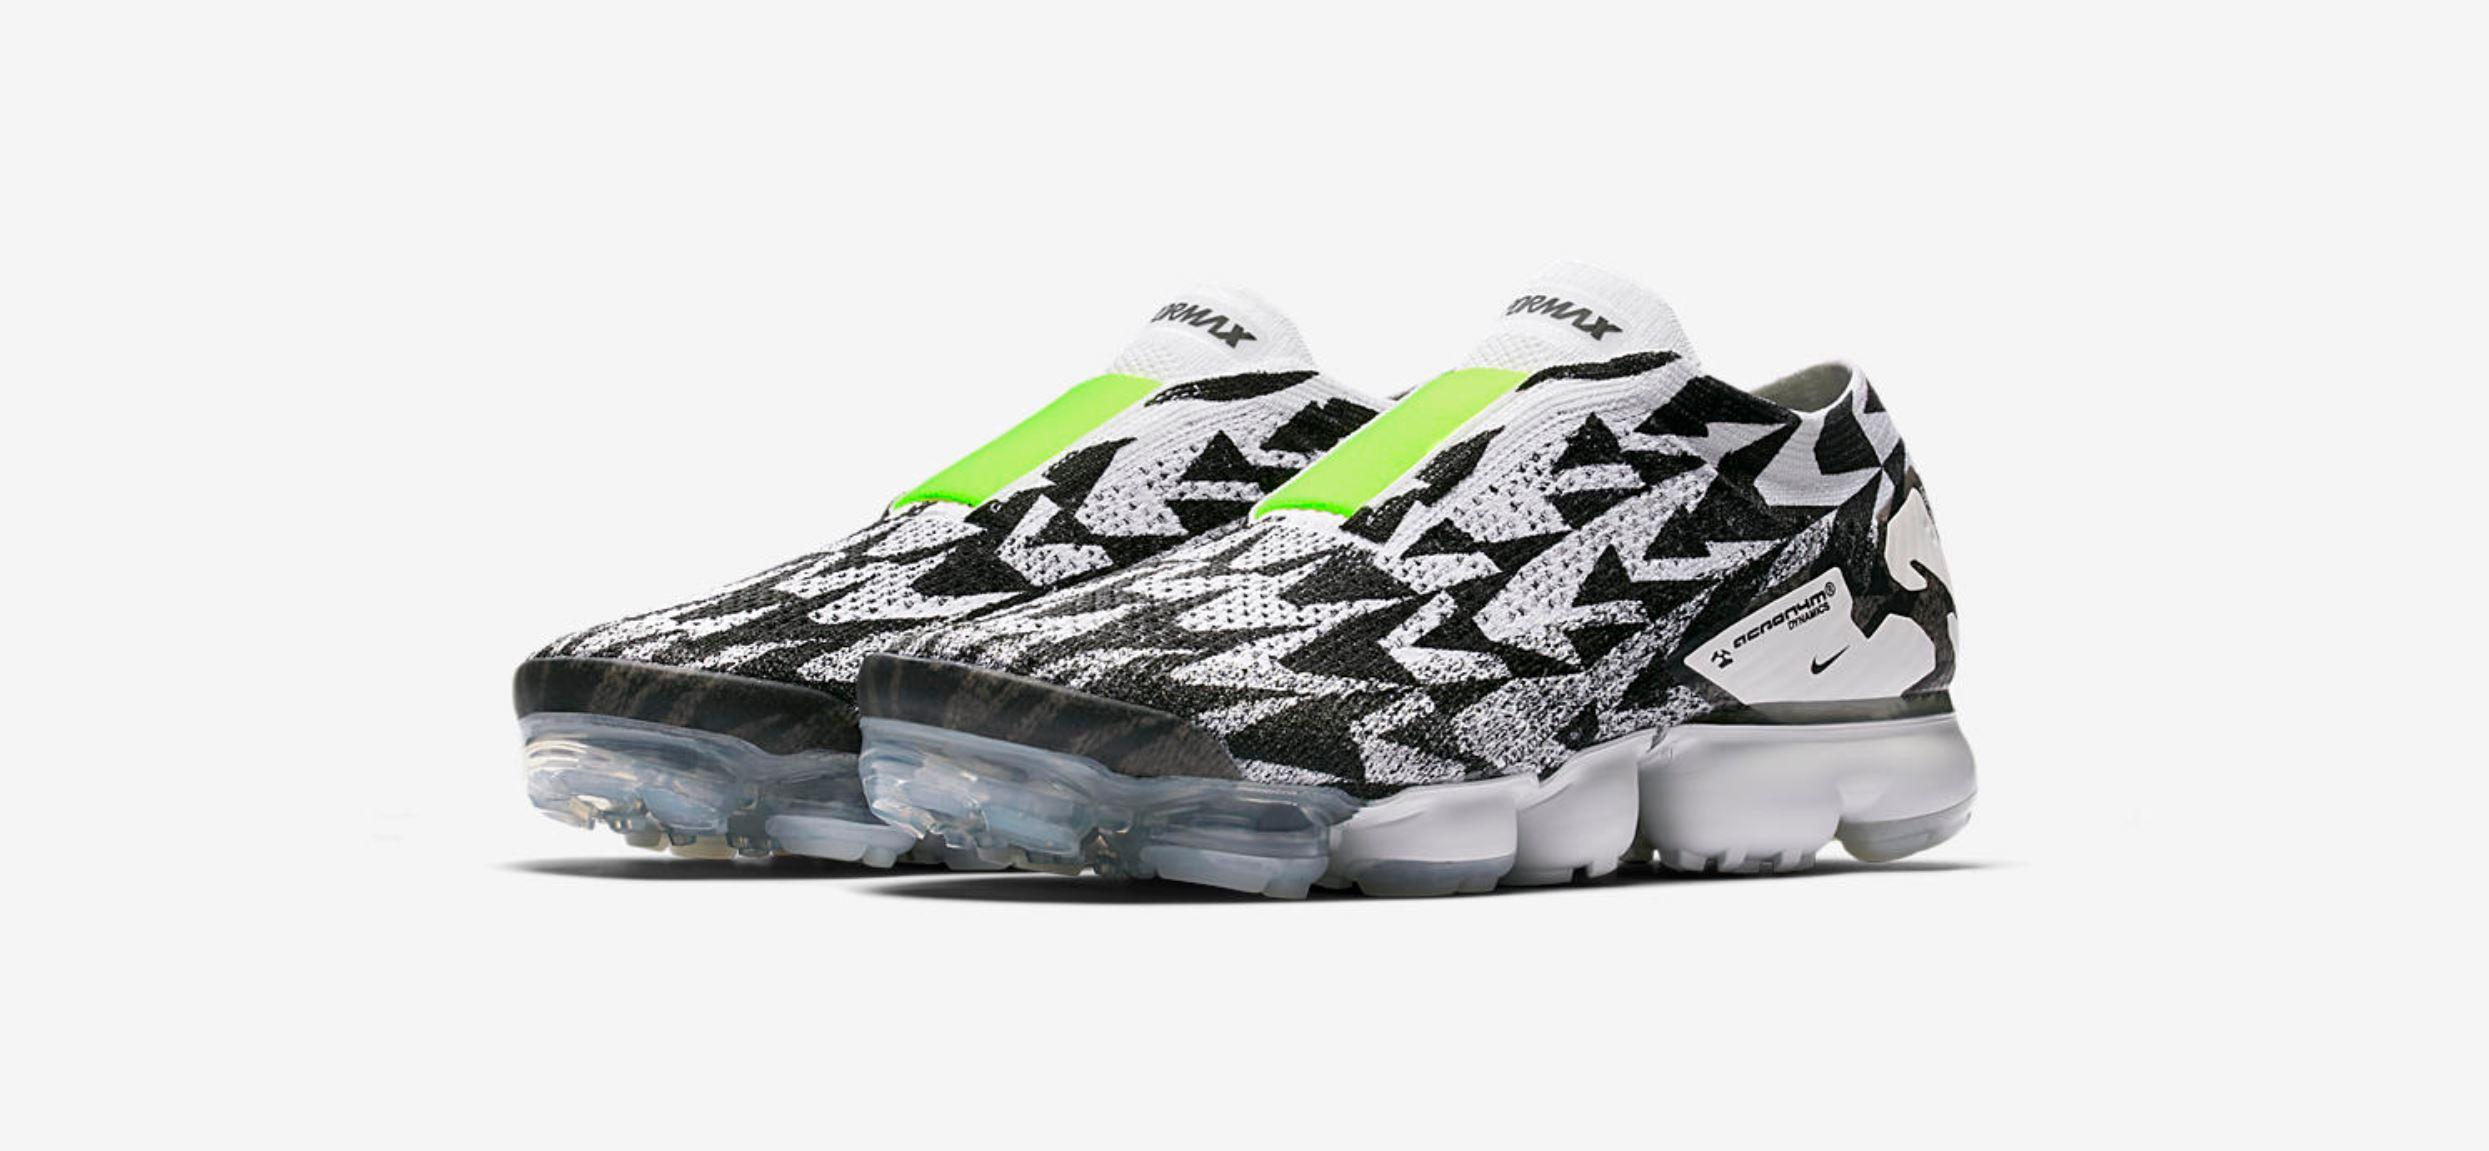 ea24f249f6cfc ACRONYM Nike Air VaporMax Moc 2 5 - WearTesters